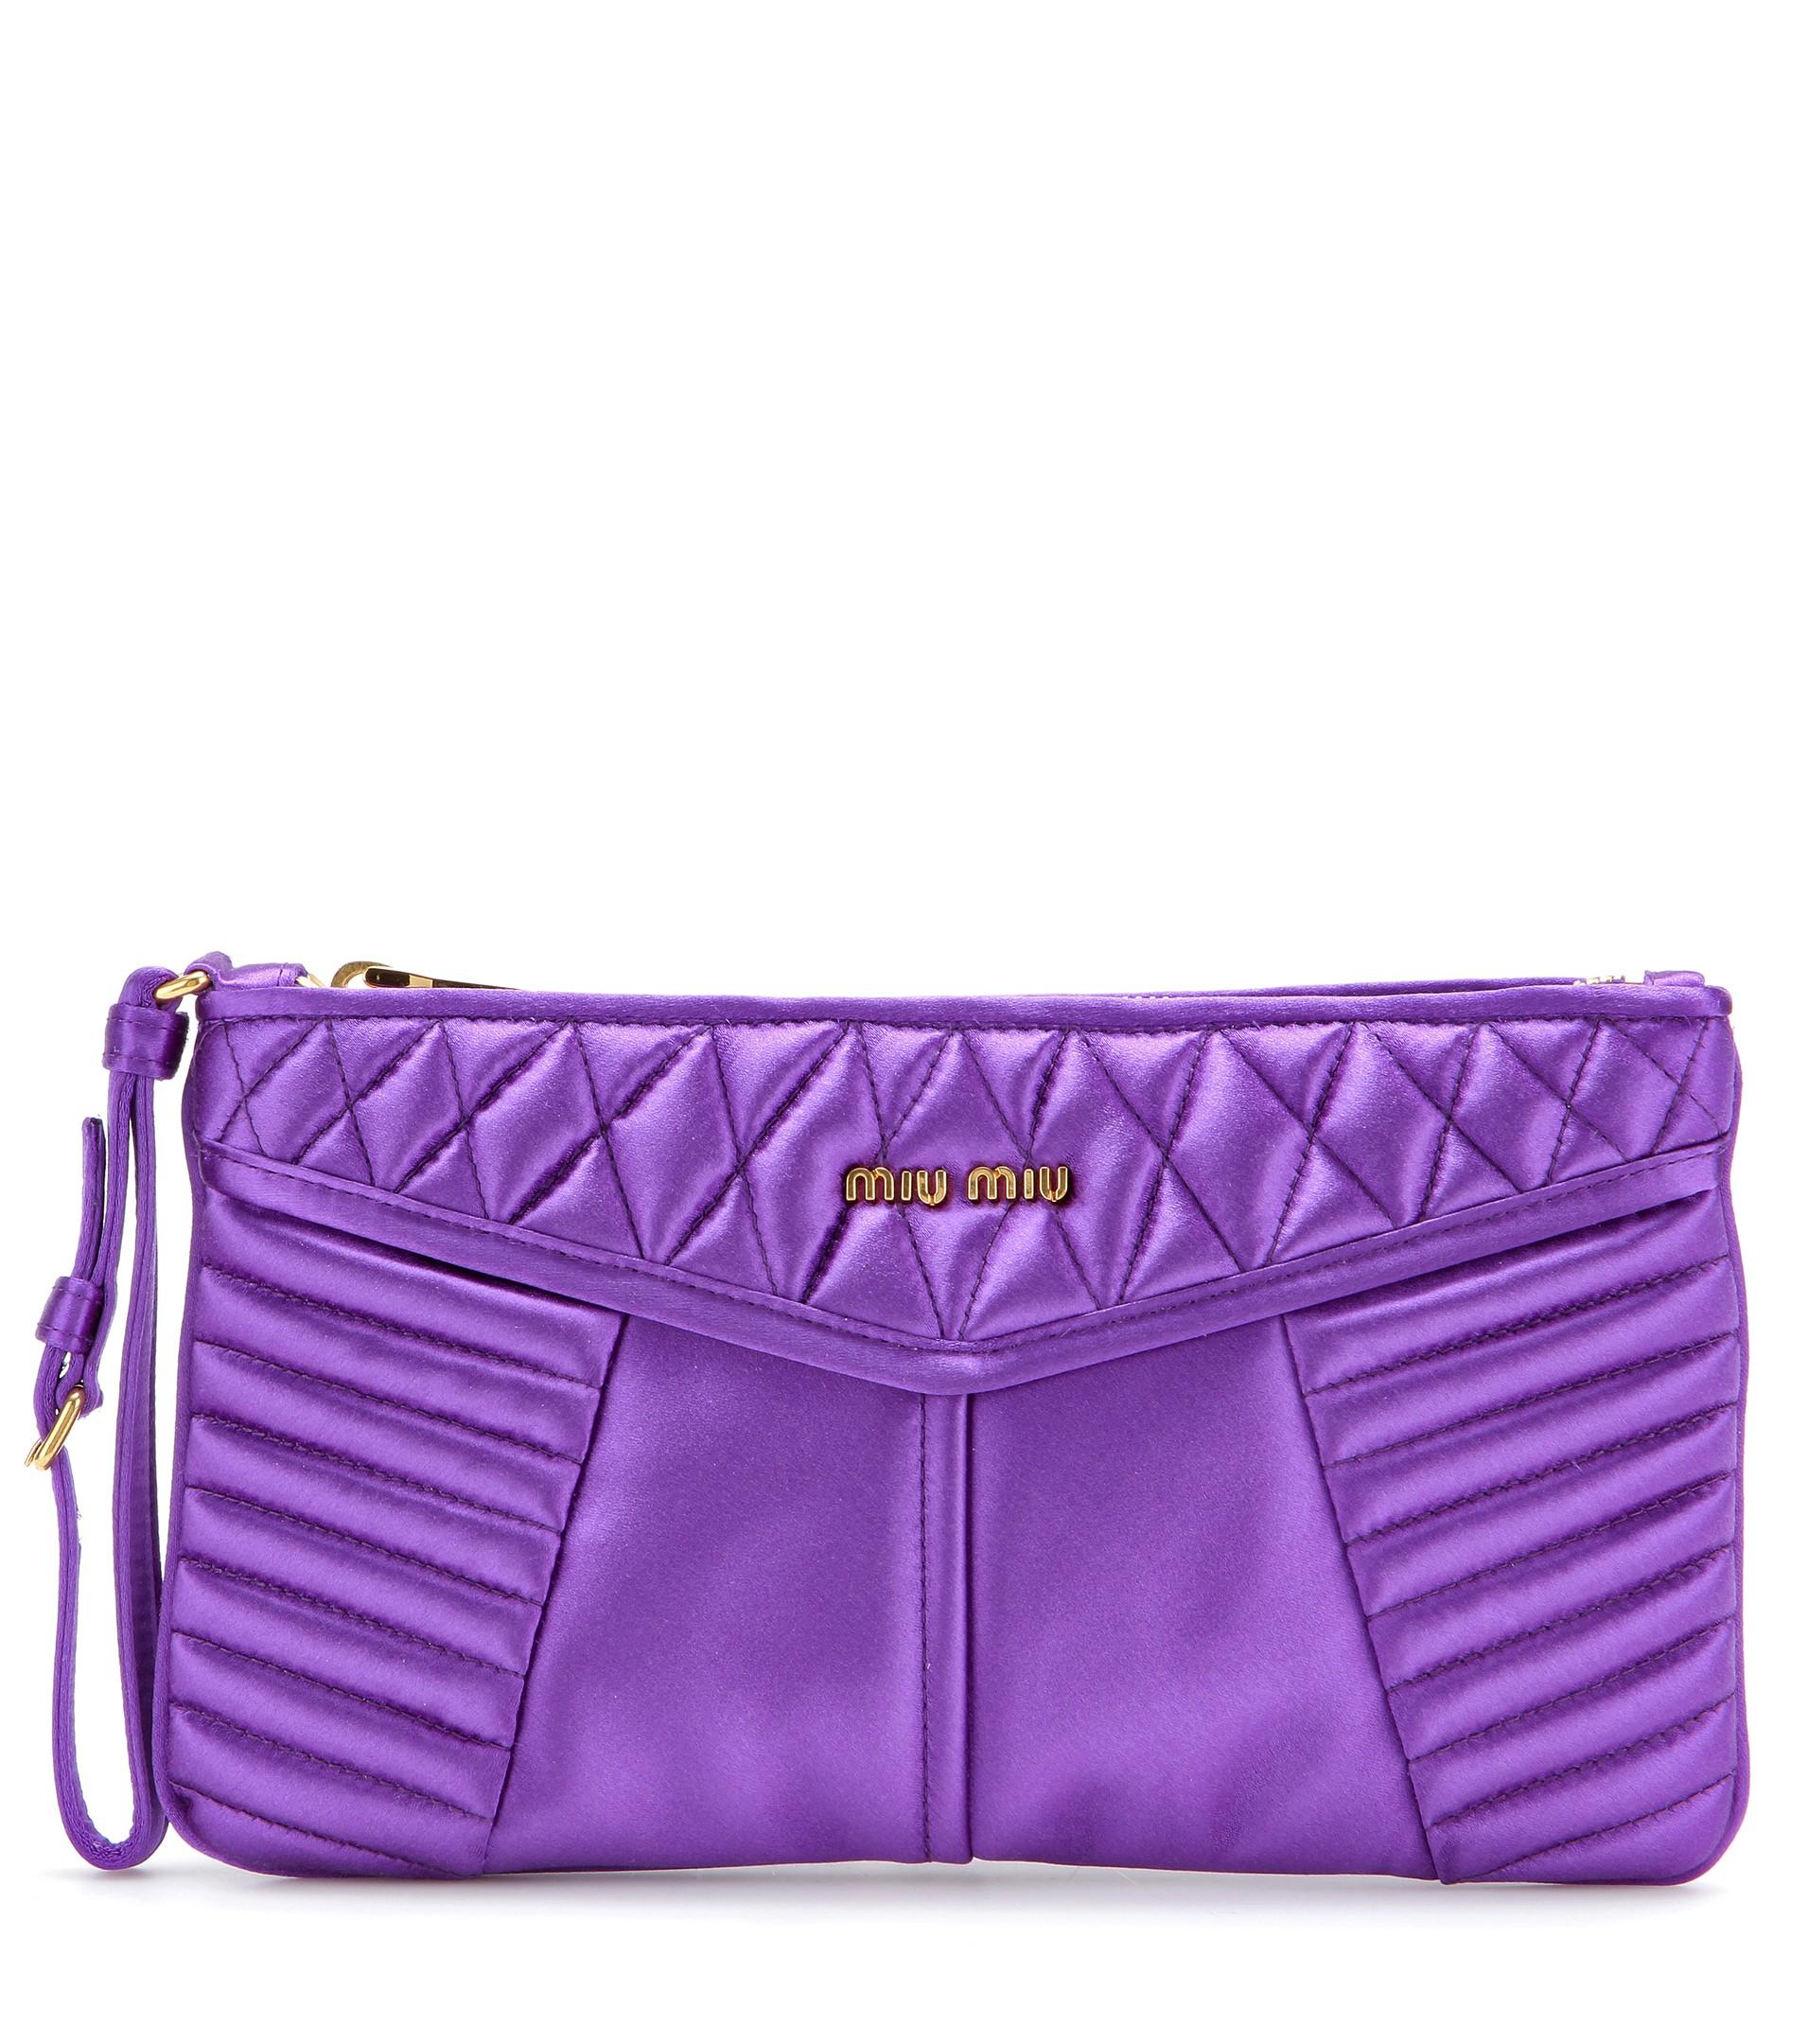 lyst miu miu matelass satin clutch in purple. Black Bedroom Furniture Sets. Home Design Ideas